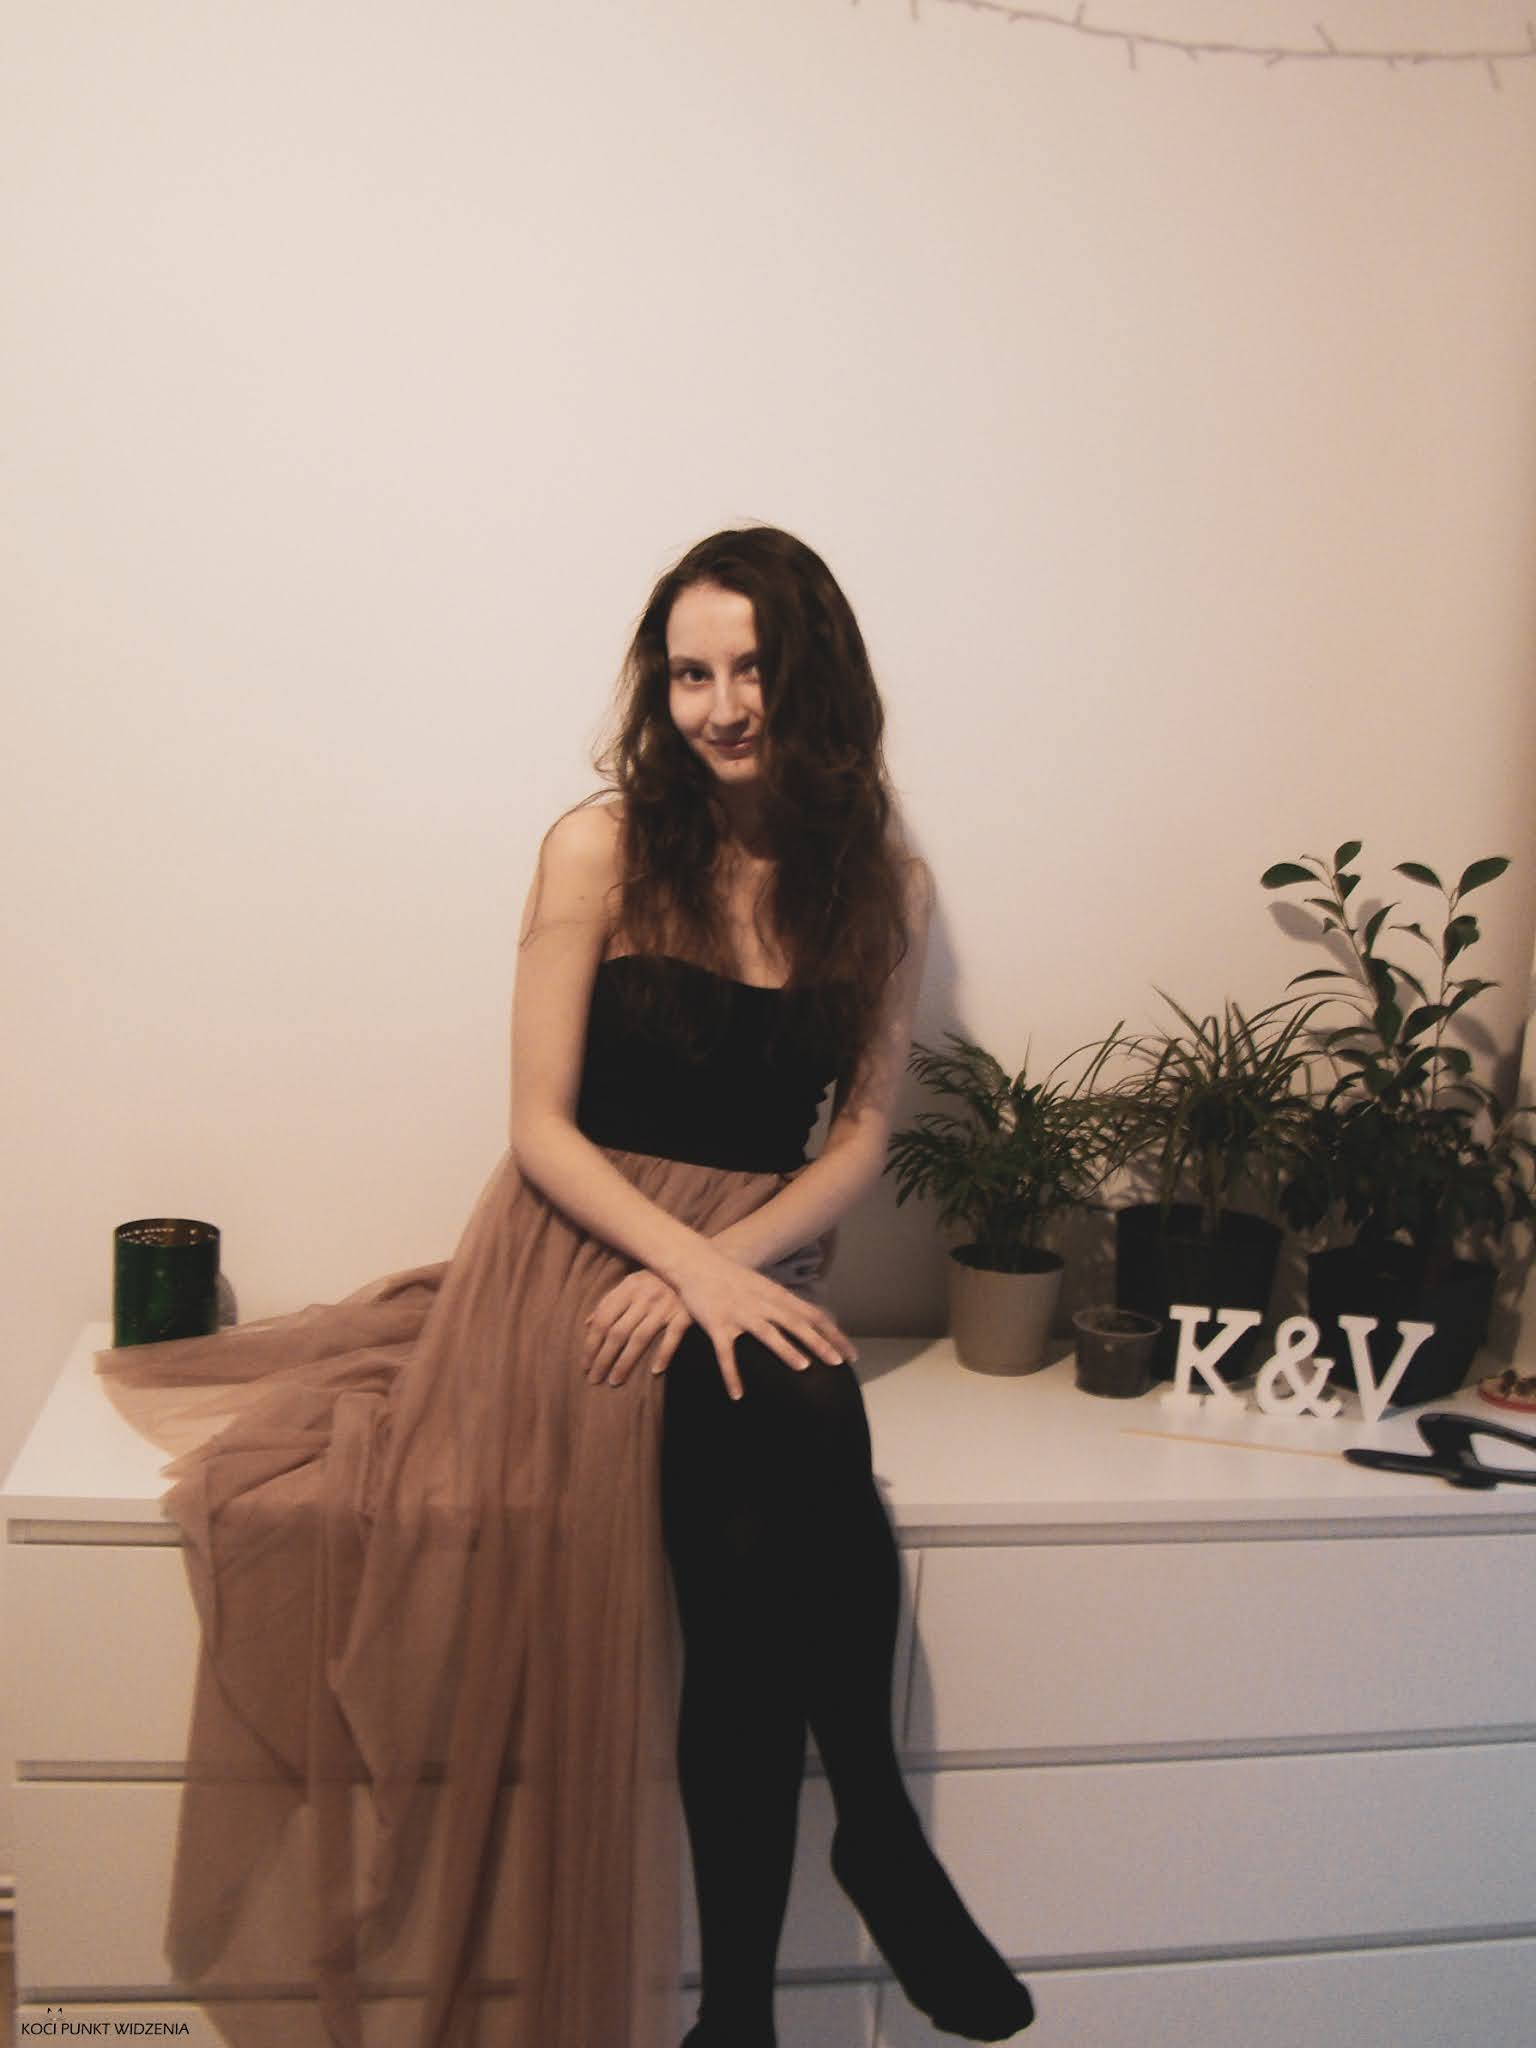 sukienka na studniówkę tiul